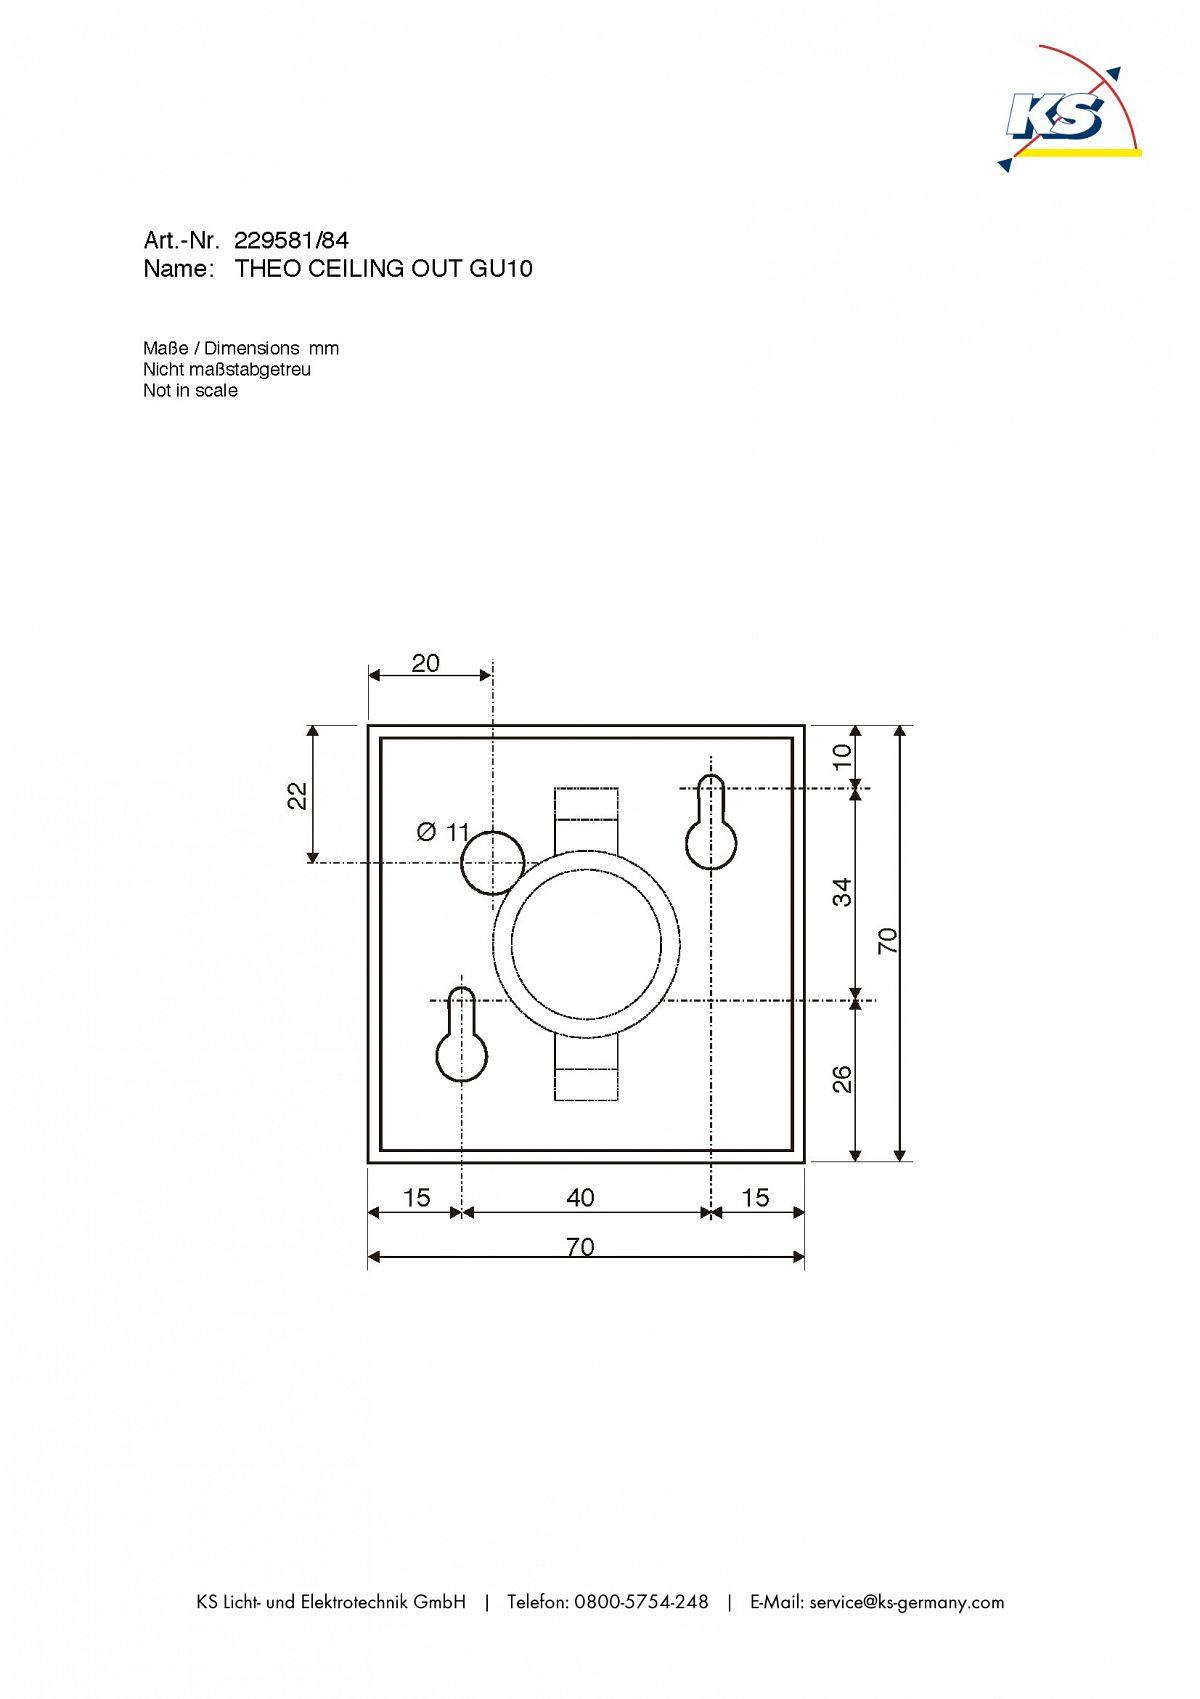 au enleuchte theo ceiling out deckenleuchte eckig gu10 ip21 silbergrau slv ks licht. Black Bedroom Furniture Sets. Home Design Ideas